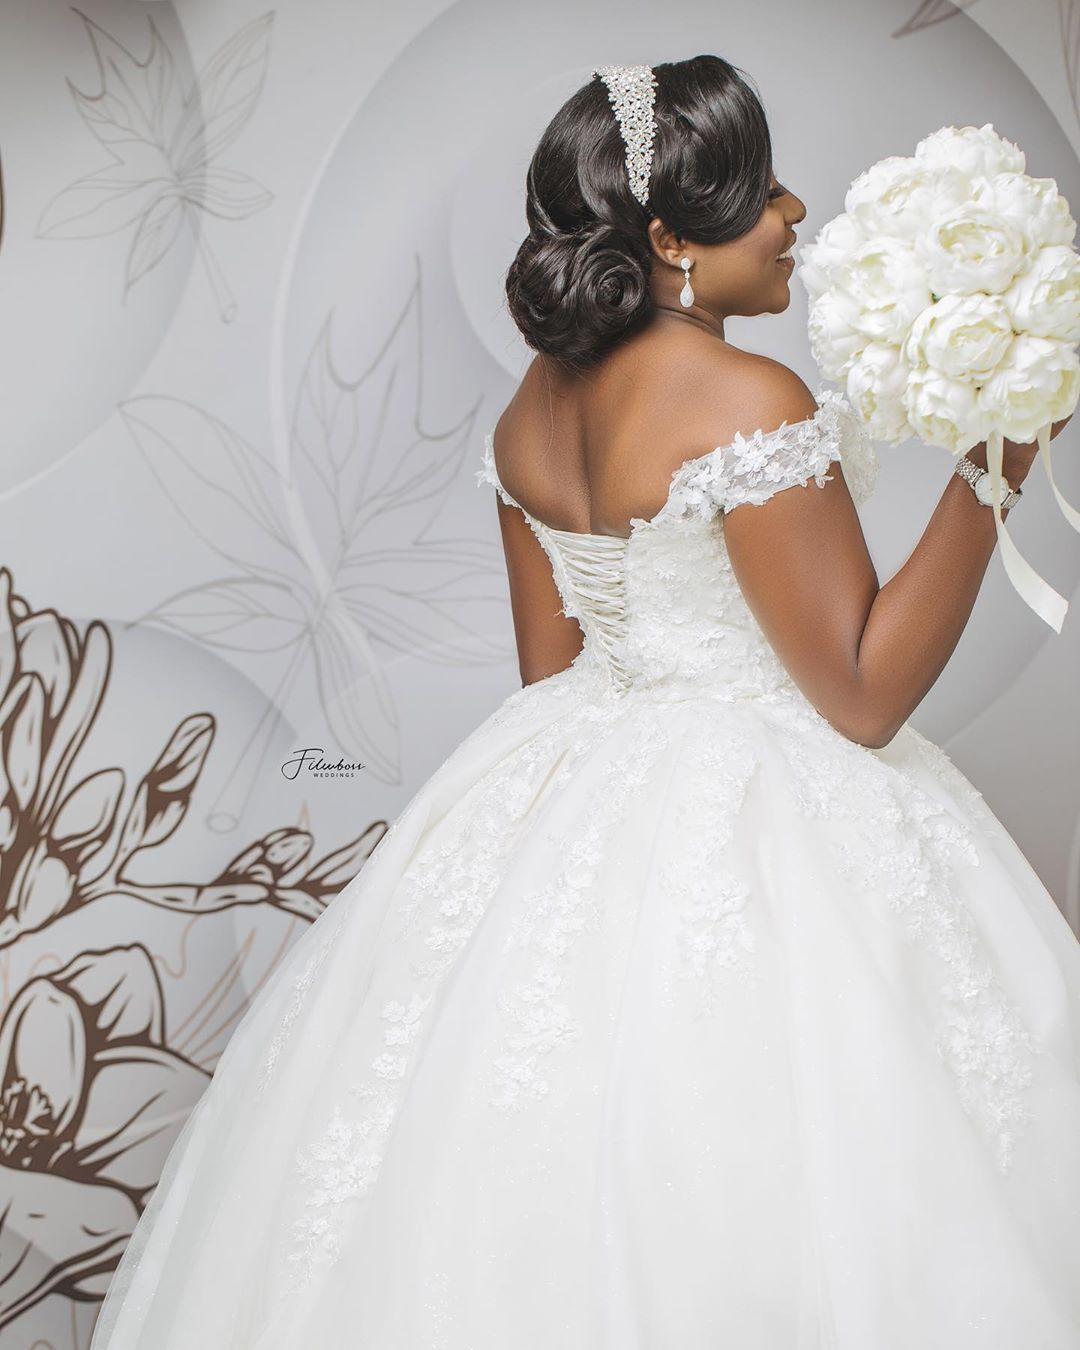 Wedding Dresses Custom made Vintage White Ivory Lace Applique Off the Shoulder Bridal Gowns Off The Shoulder Corset Up African